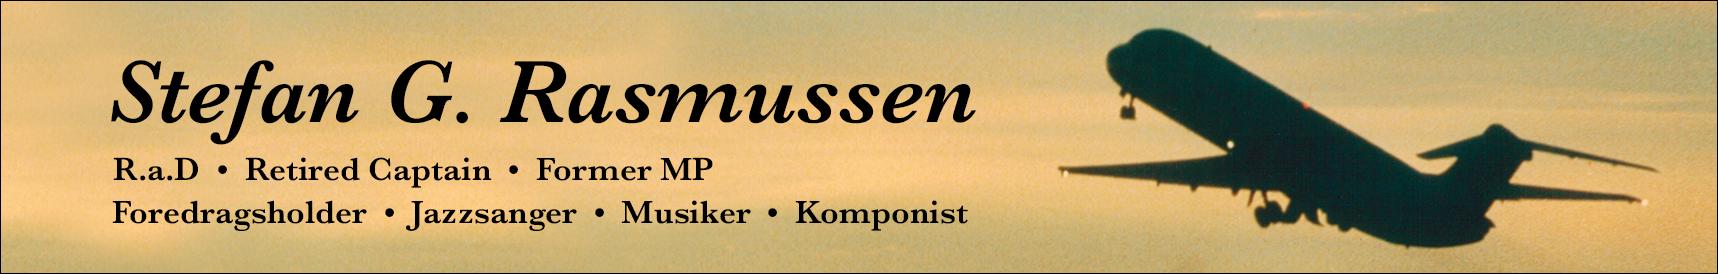 Stefan G. Rasmussen logo